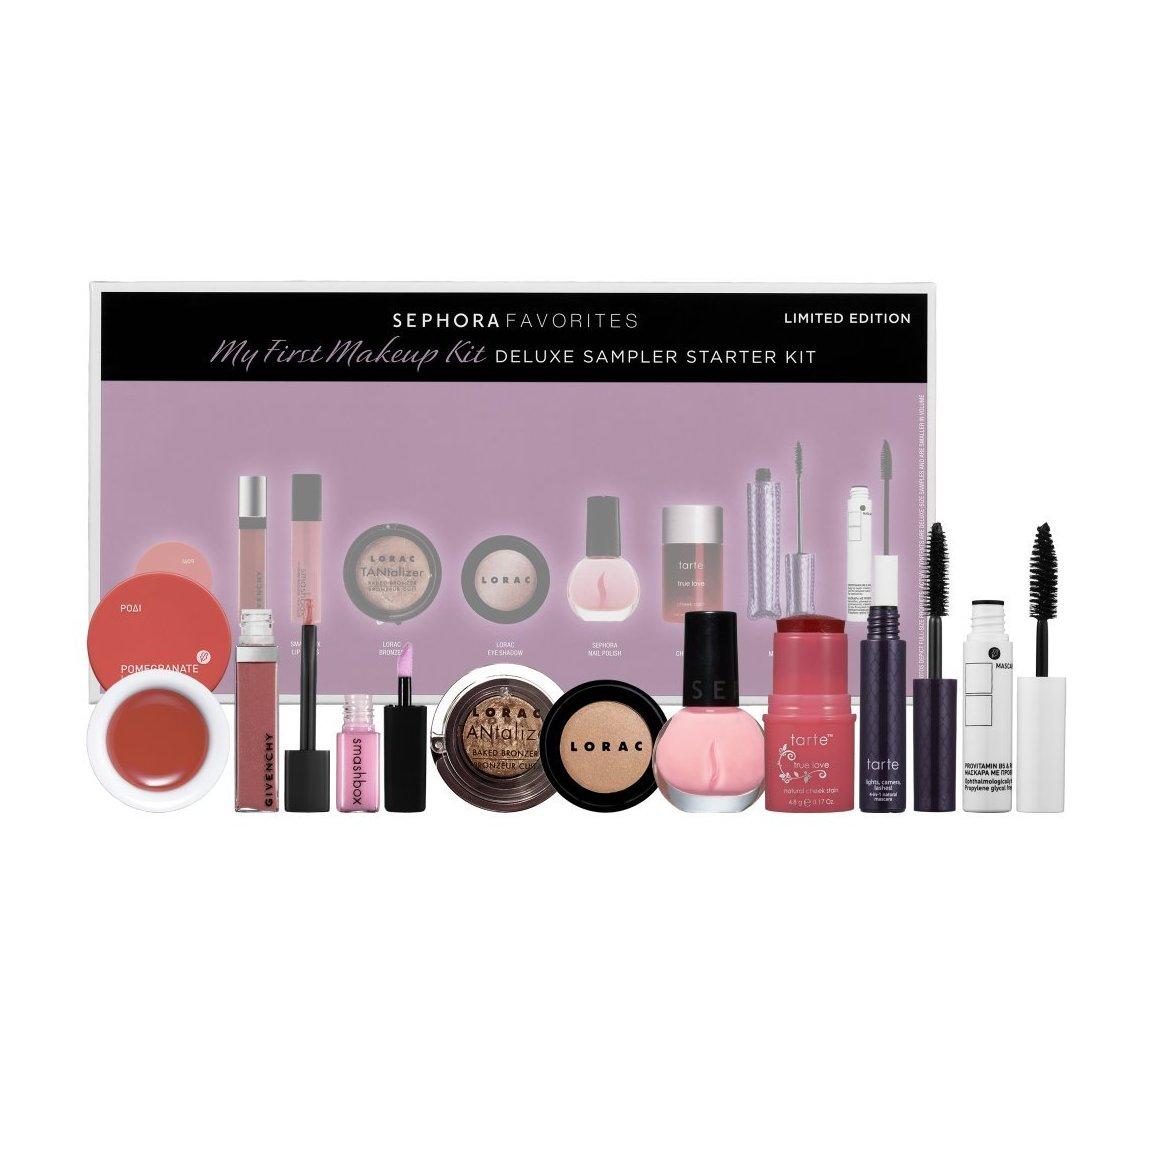 Sephora Favorites My First Makeup Kit Deluxe Sampler Beautylish